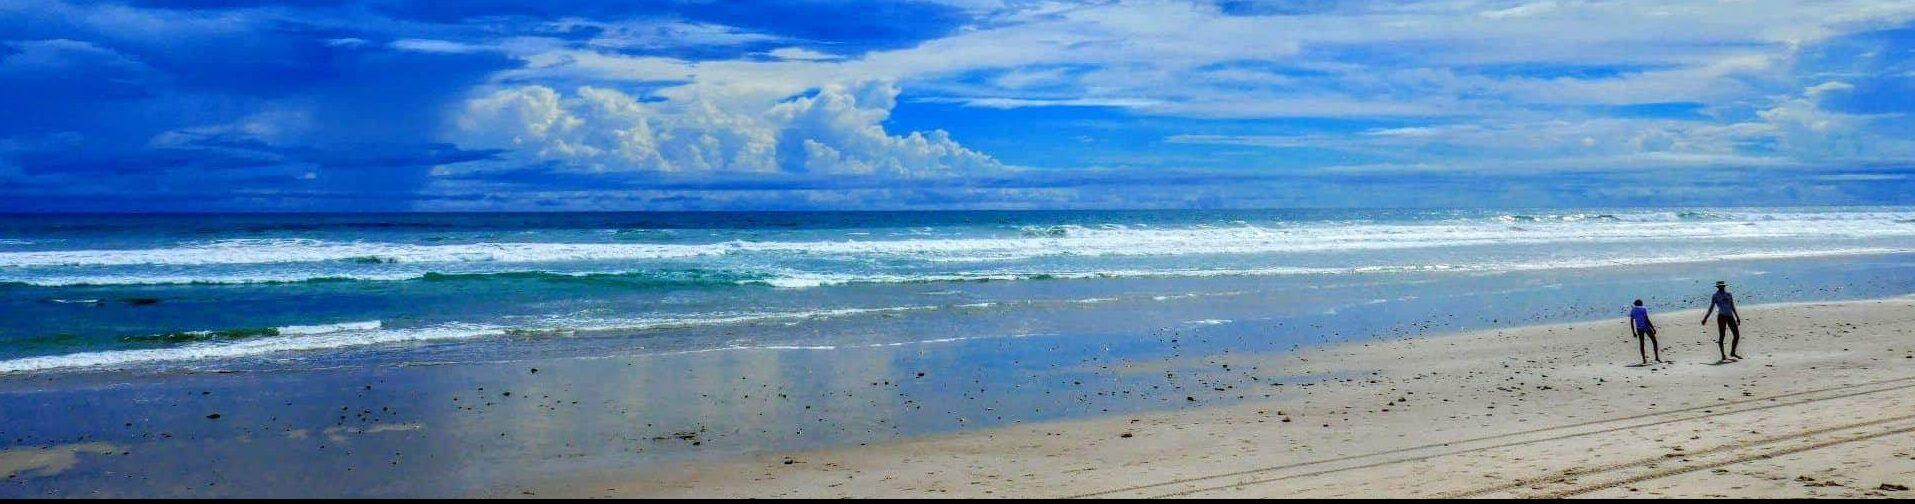 plage sable blanc costa rica voyage santa theresa sud de Nicoya